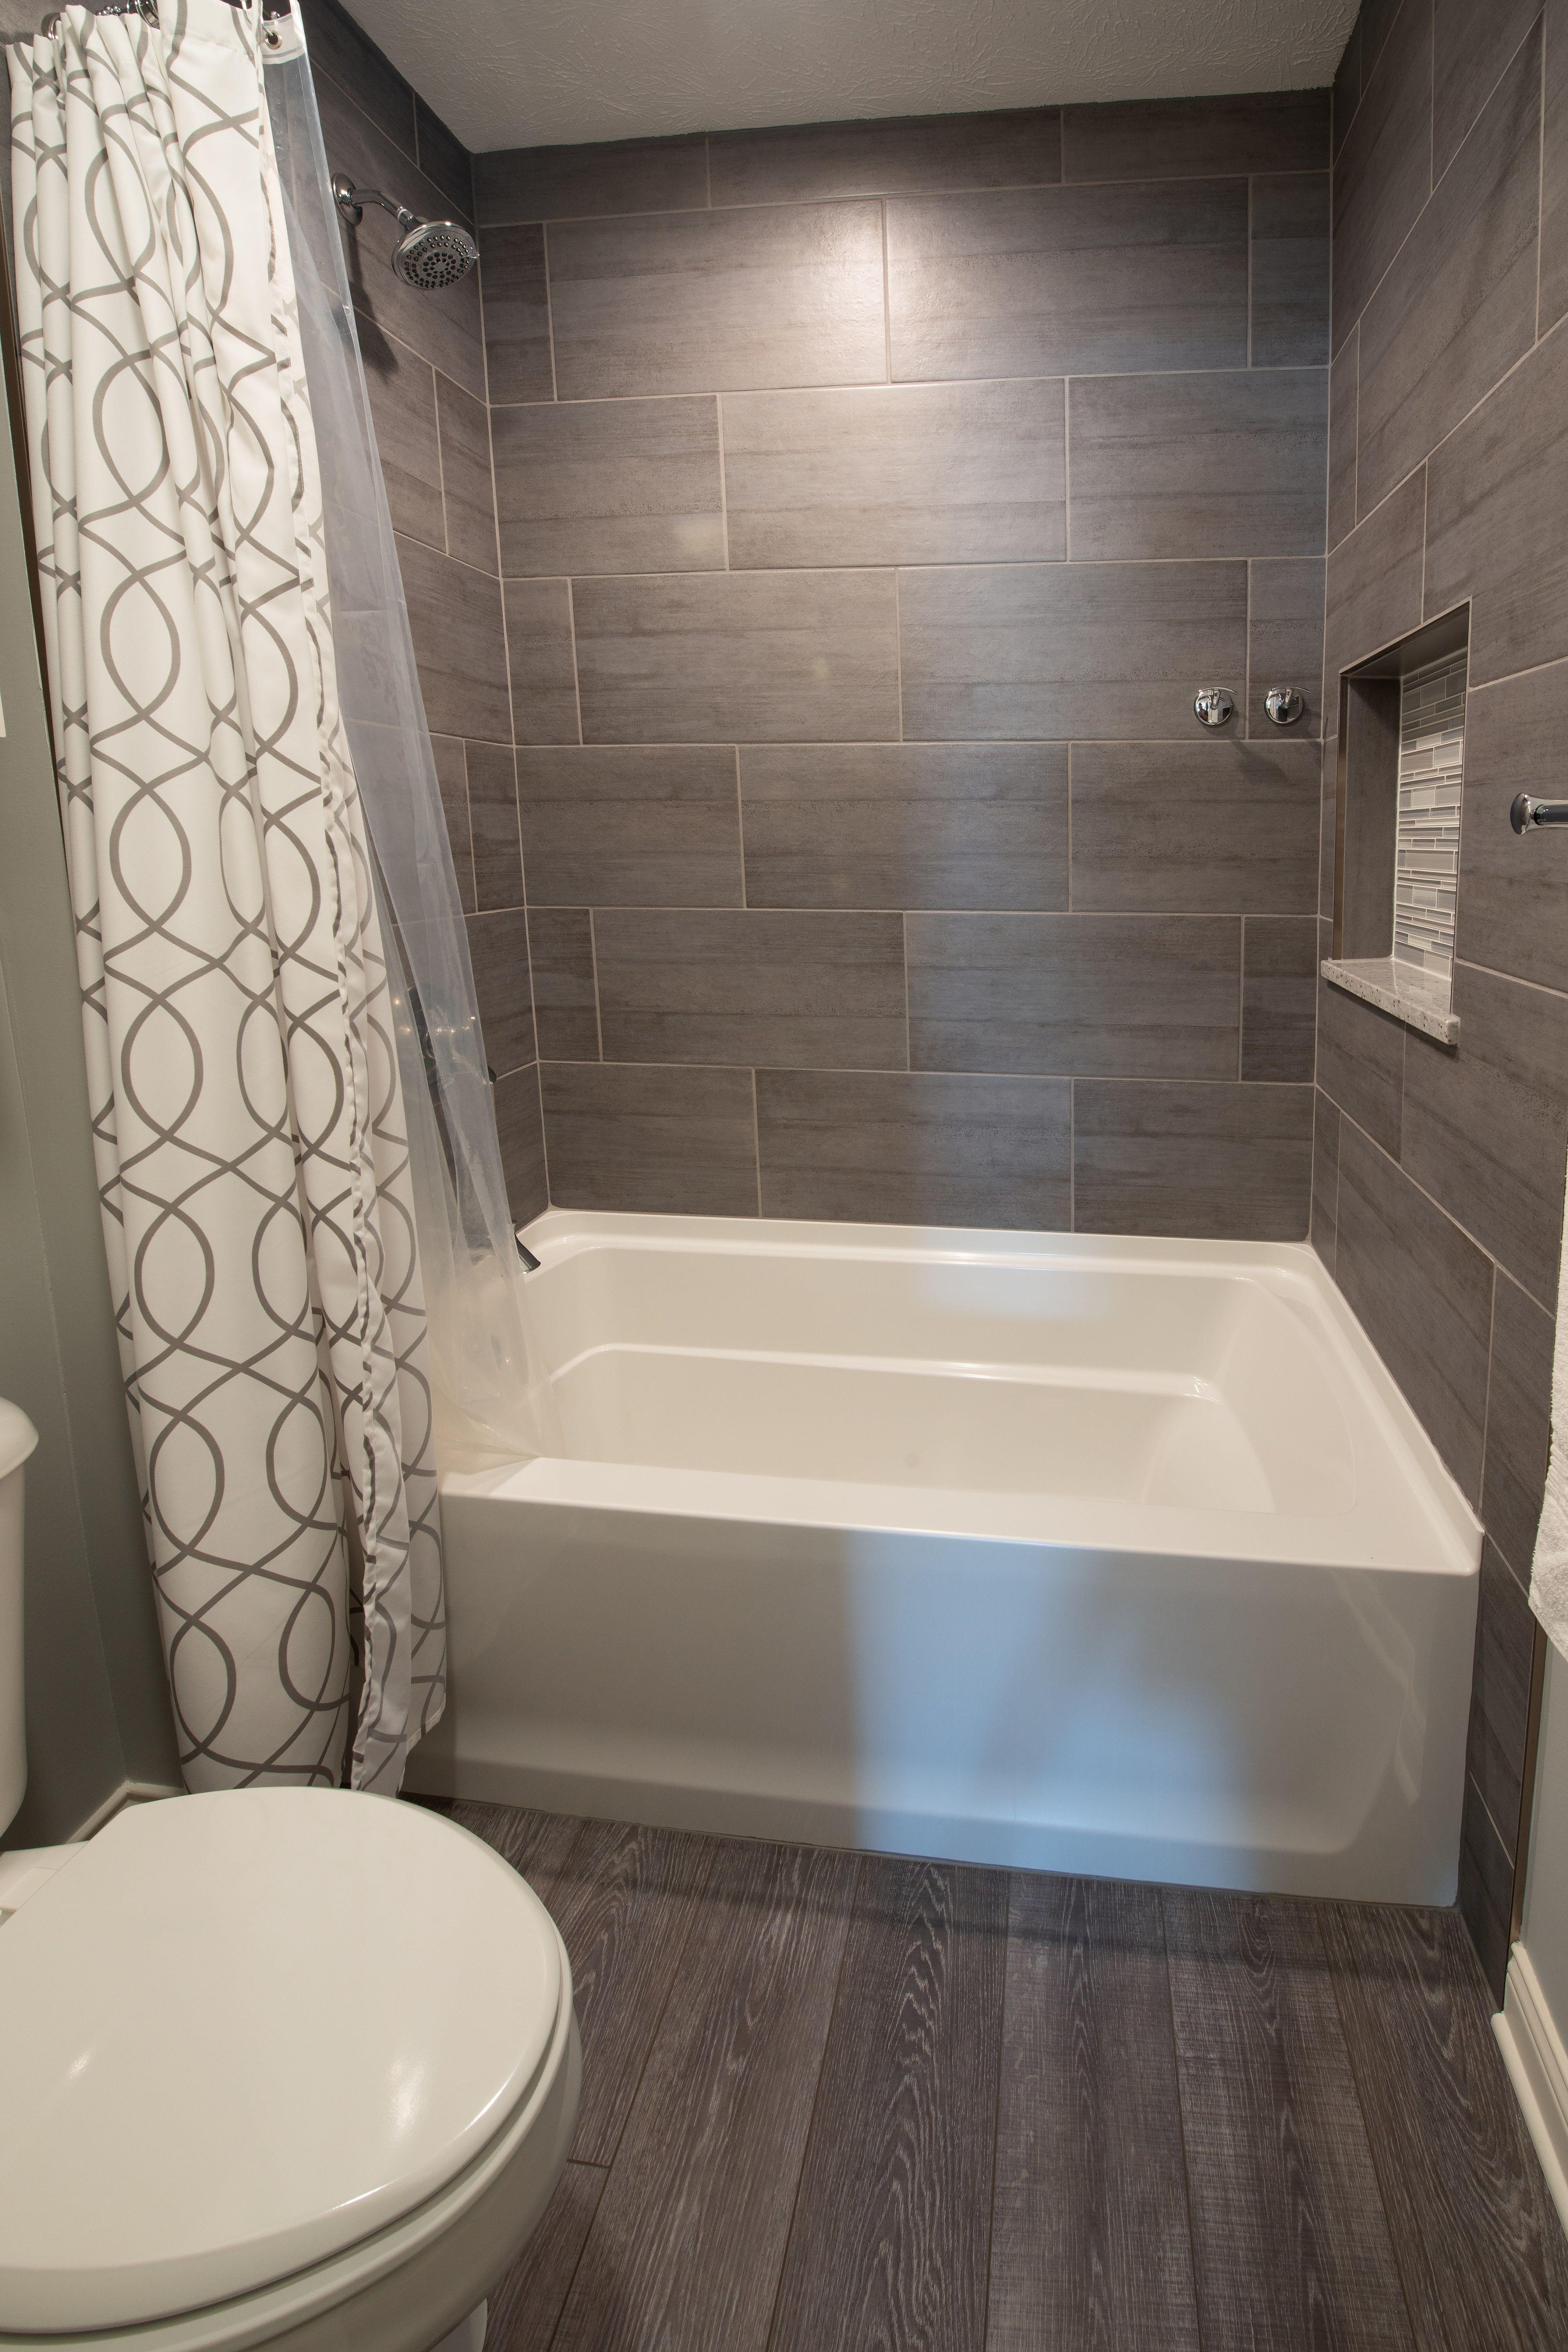 Guest Bathroom Remodel In Indiana Wood Floors Subway Tile Wall In Tub Shower Guest Bathroom Small Guest Bathroom Remodel Bathroom Remodel Shower